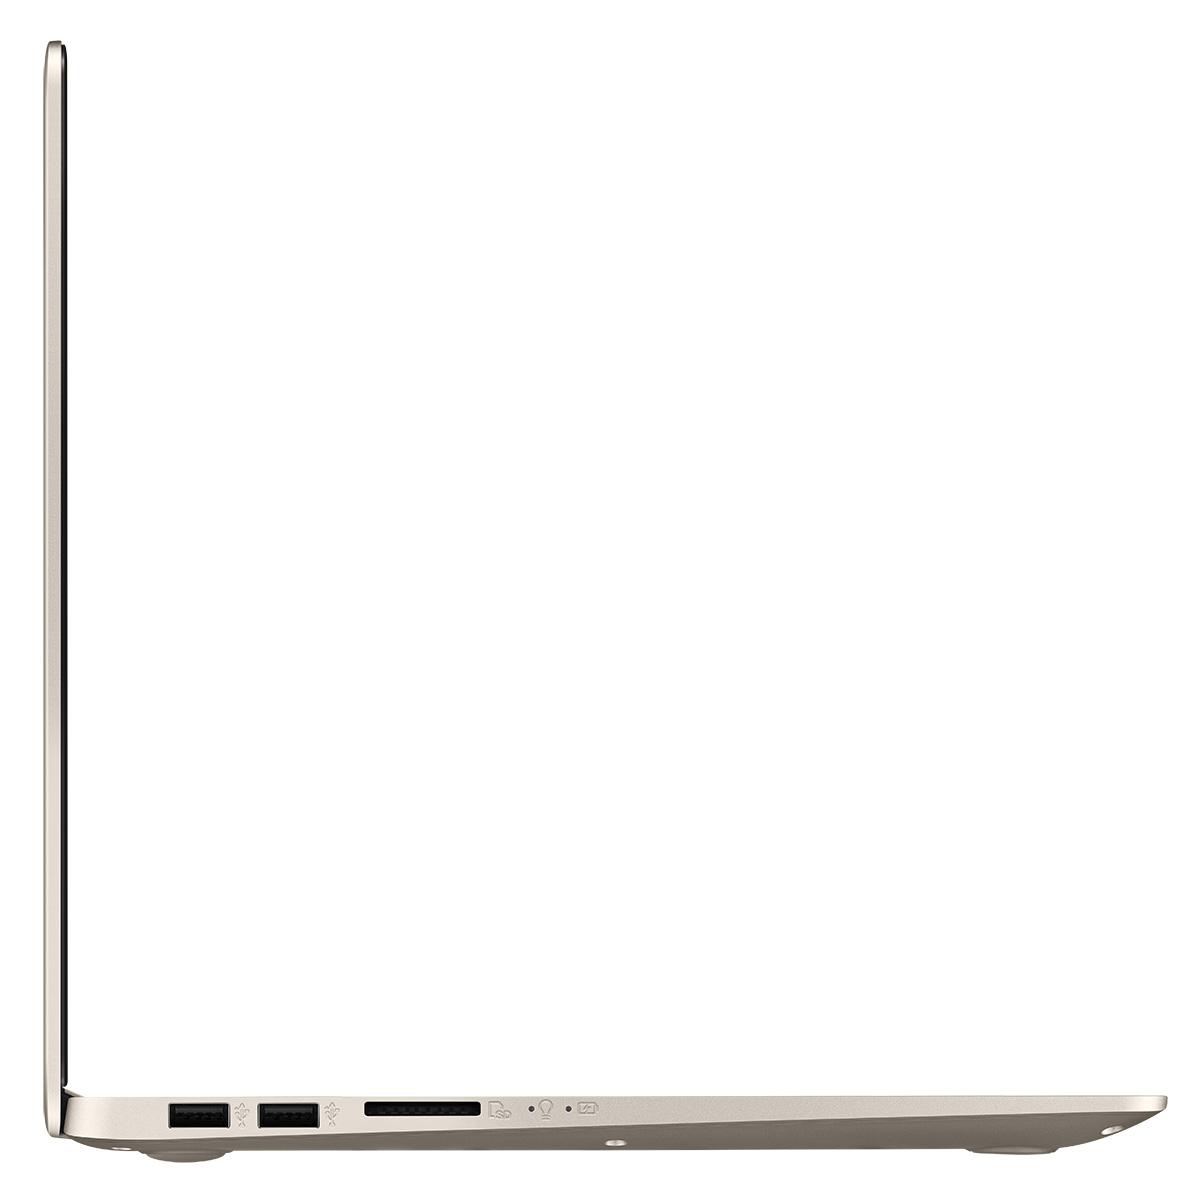 Asus 90NB0FQ5-M07070 - PC portable Asus - Cybertek.fr - 3